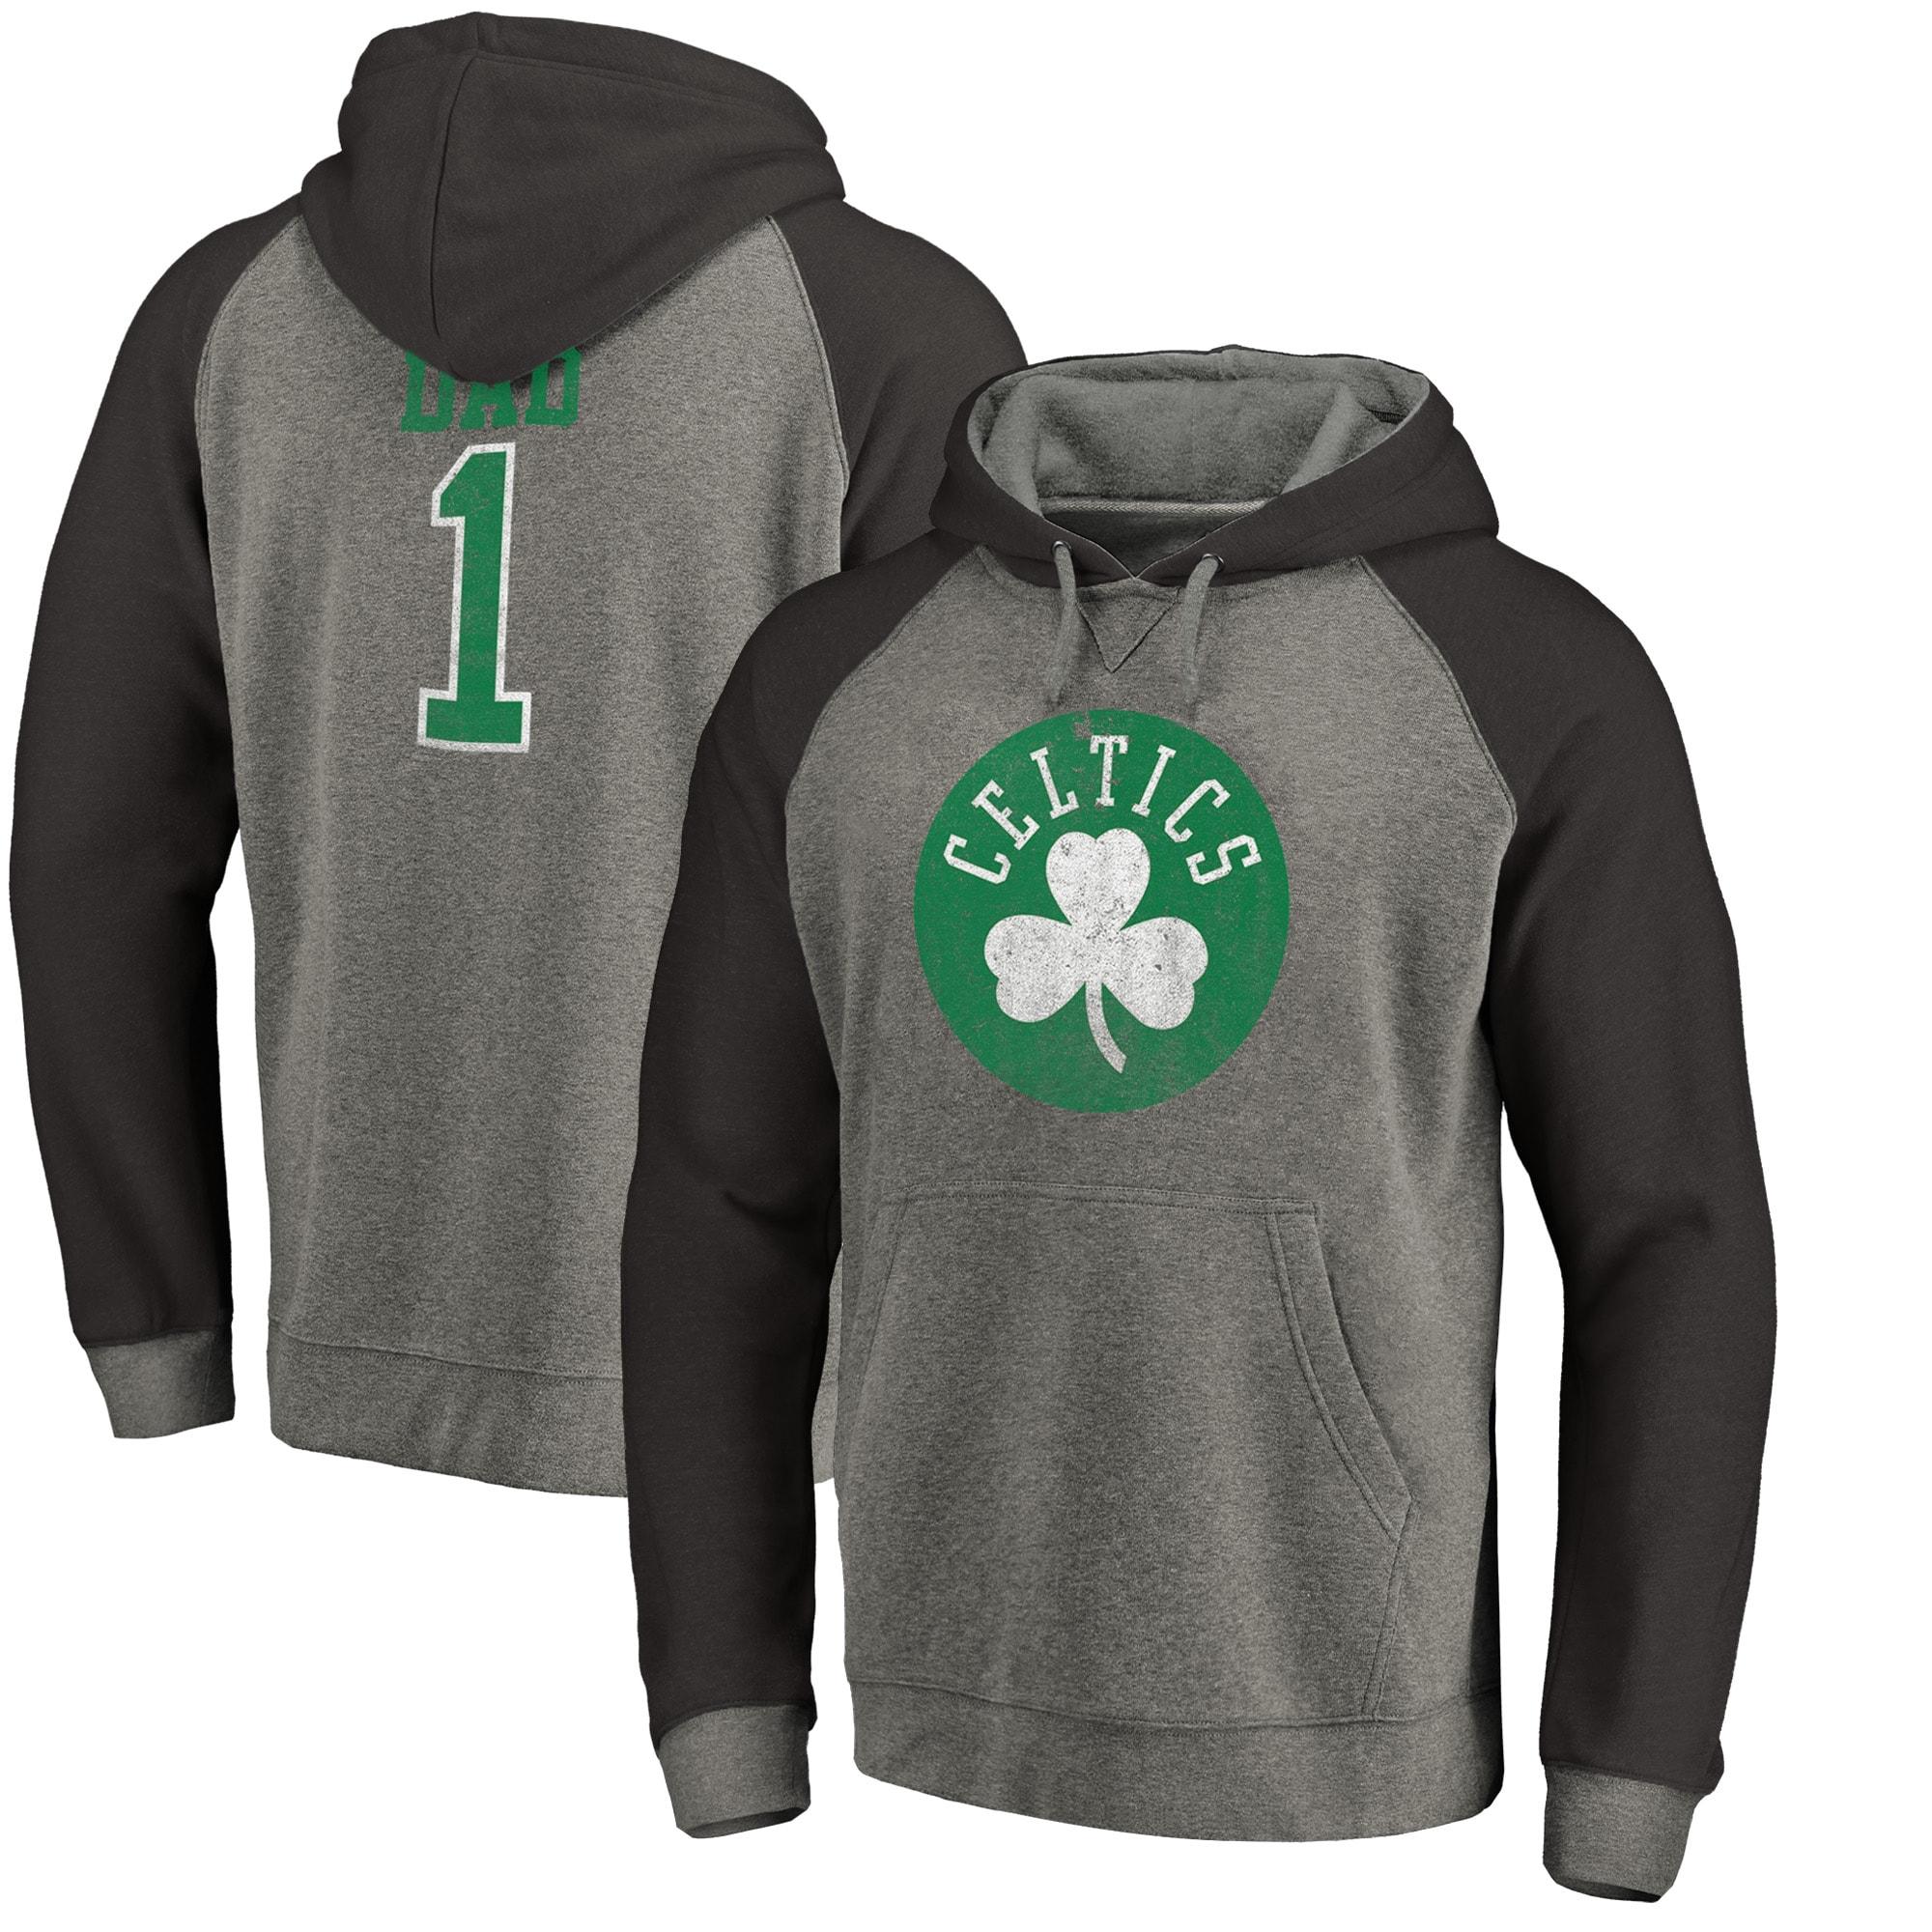 Boston Celtics Fanatics Branded Greatest Dad Long Sleeve Tri-Blend Raglan Hoodie - Heathered Gray